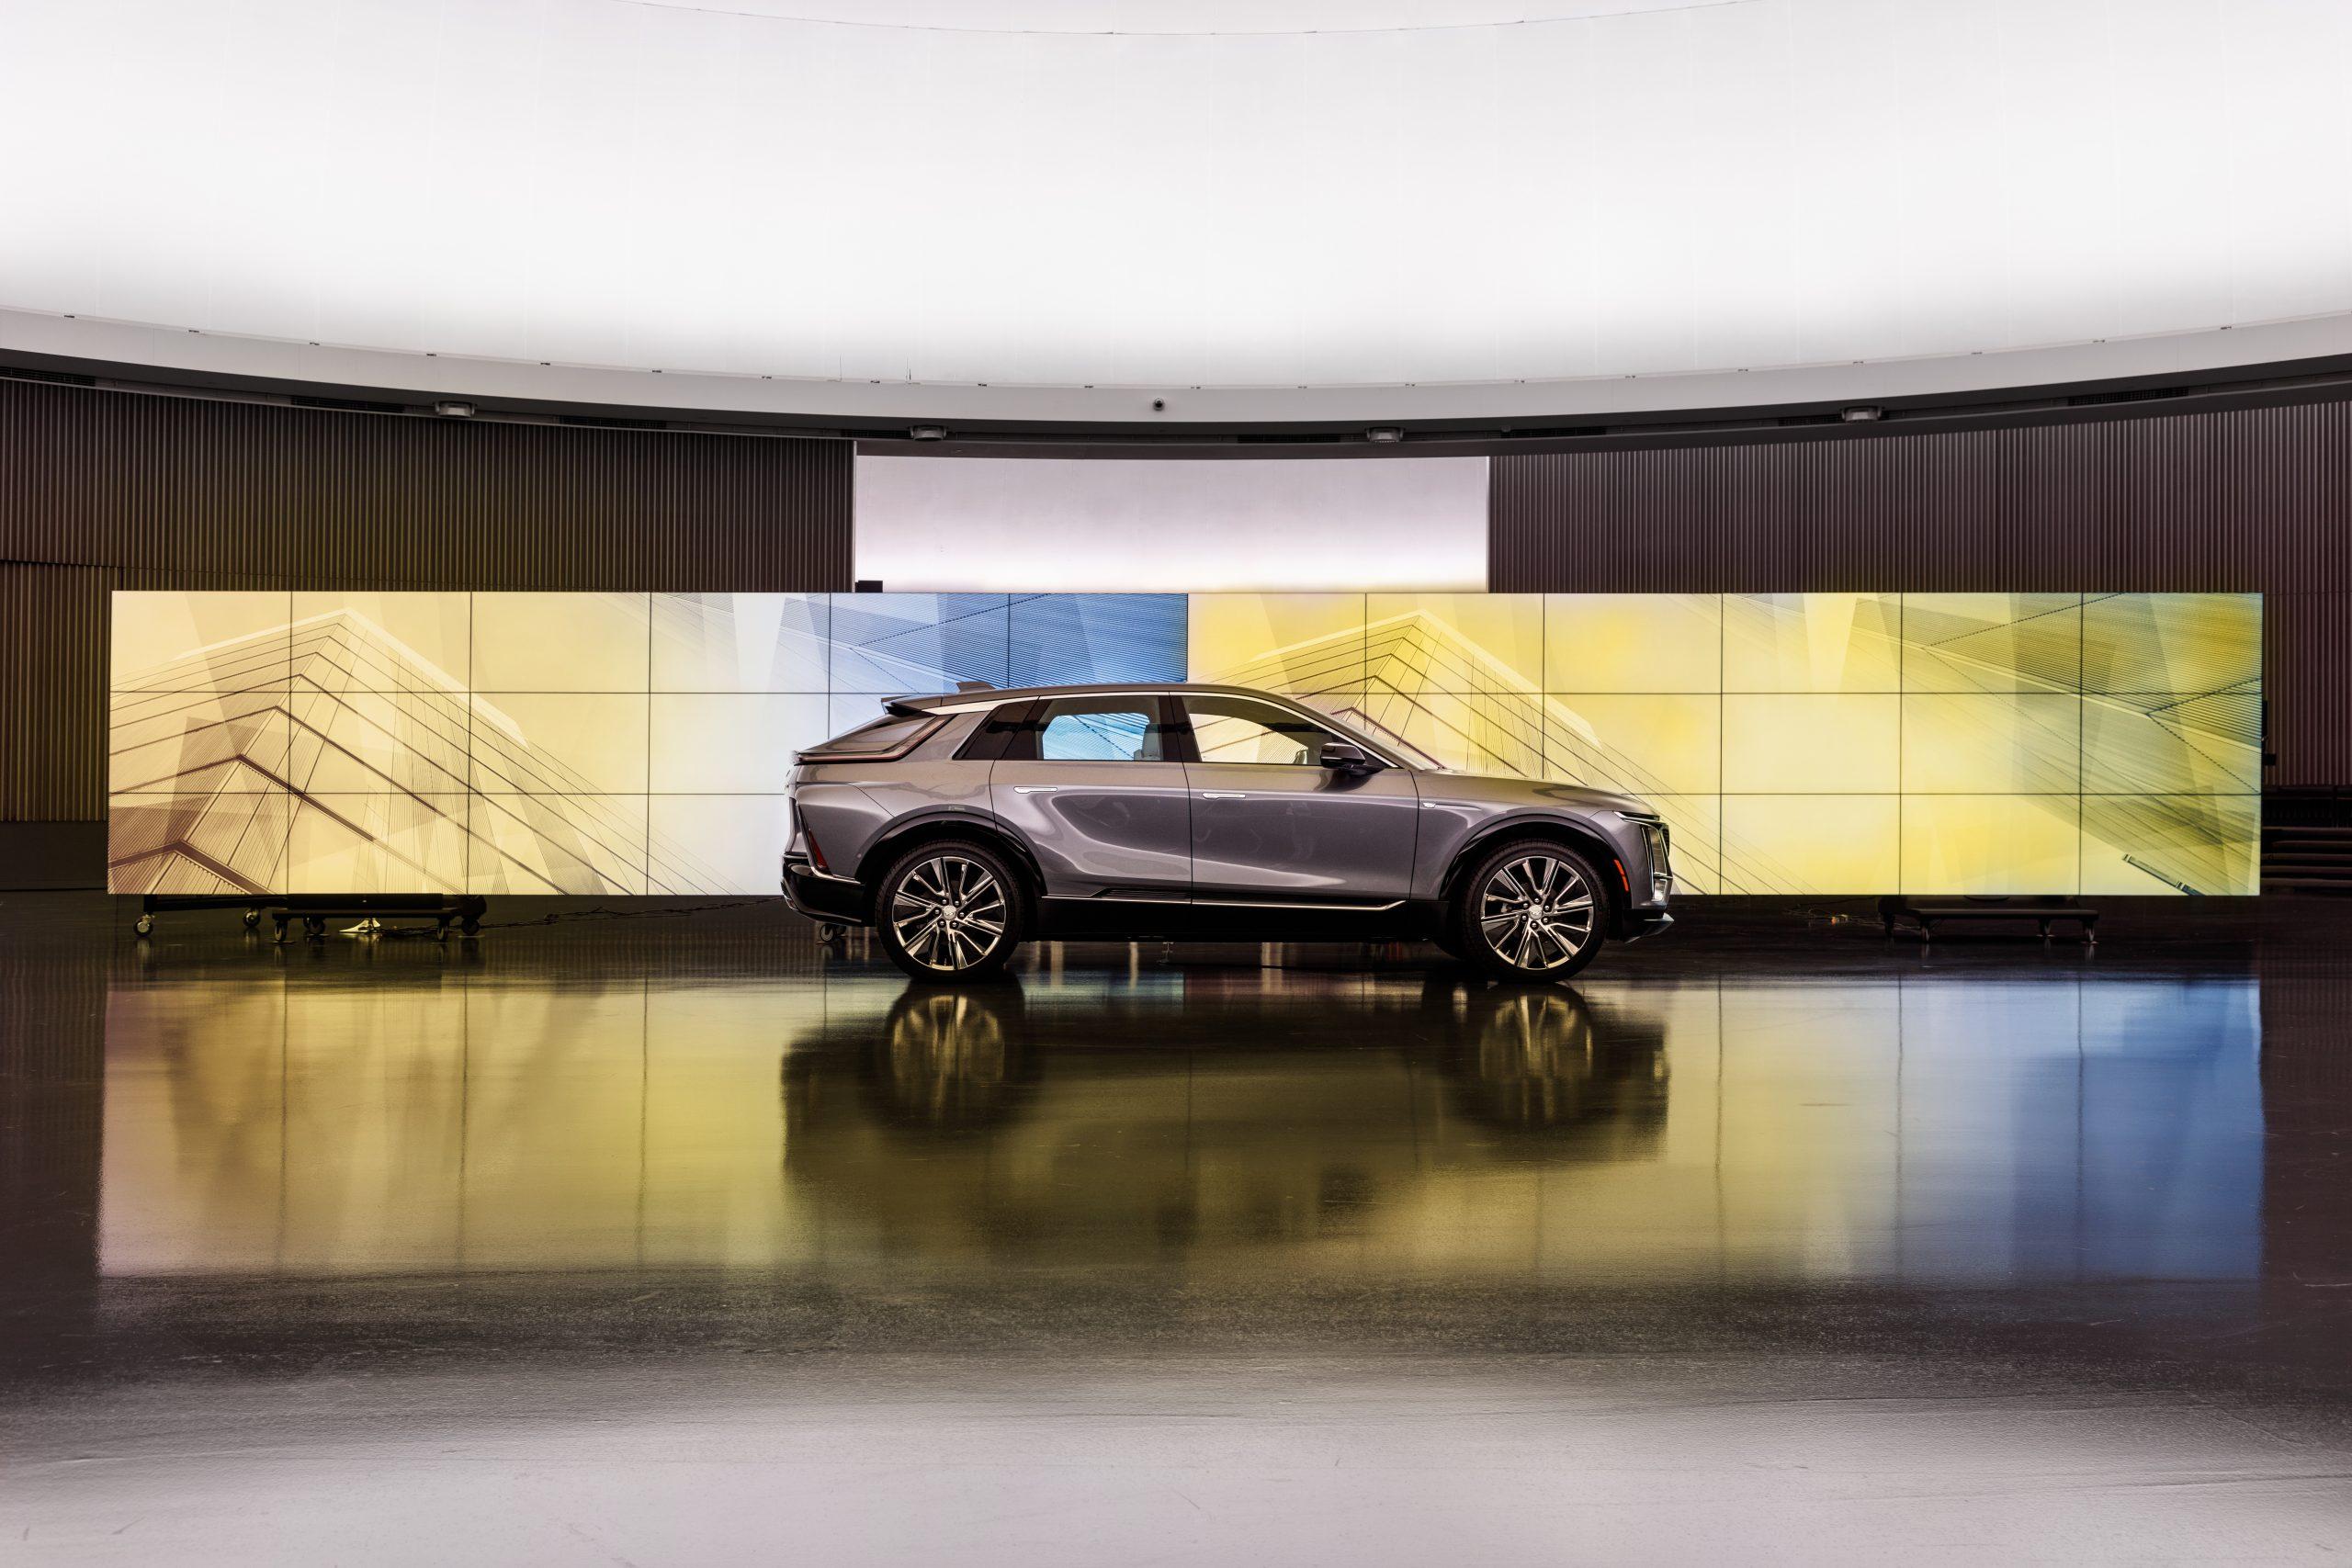 2023 Cadillac Lyriq profile